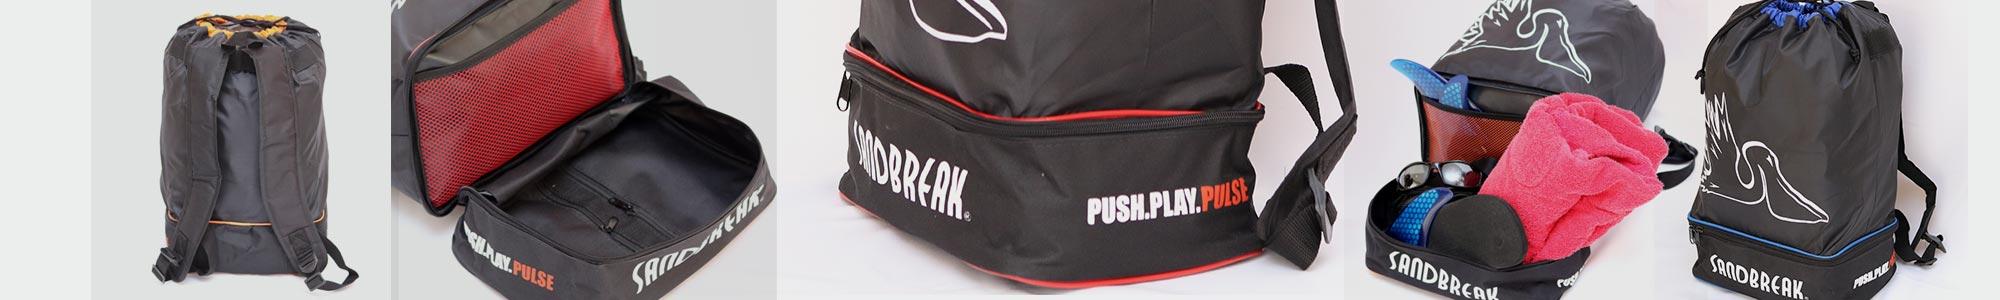 Produtos Backpack